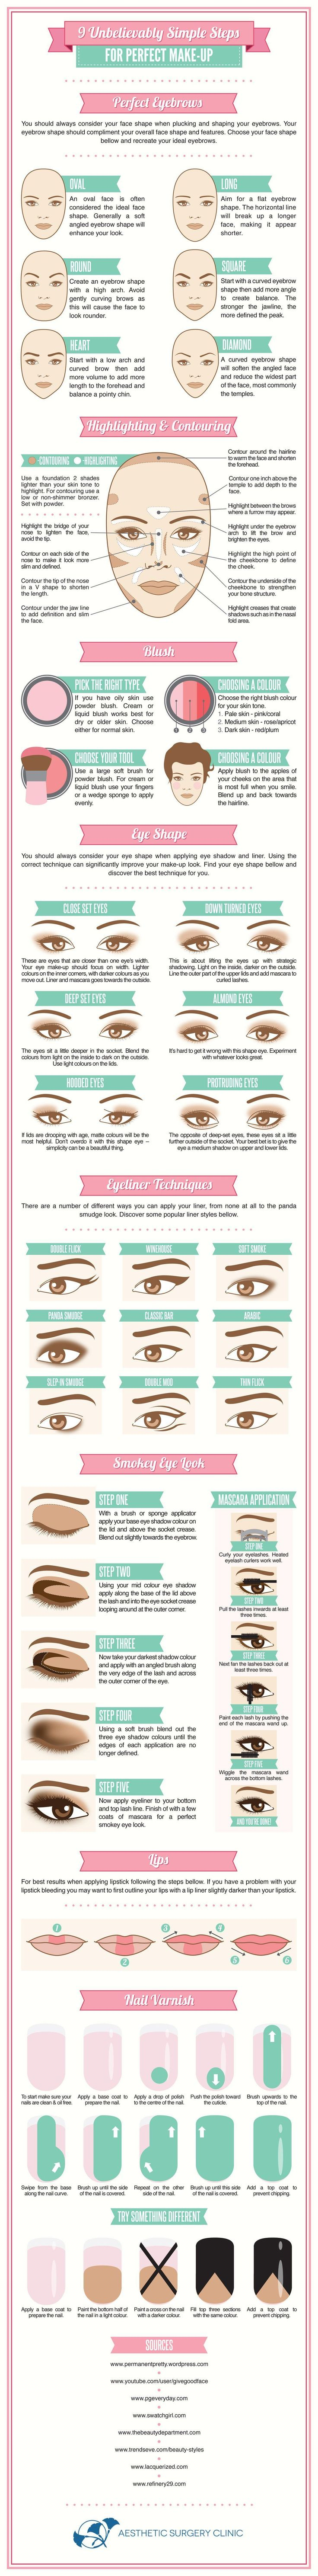 #infographic #magazine #perfect #stylist #master #makeup